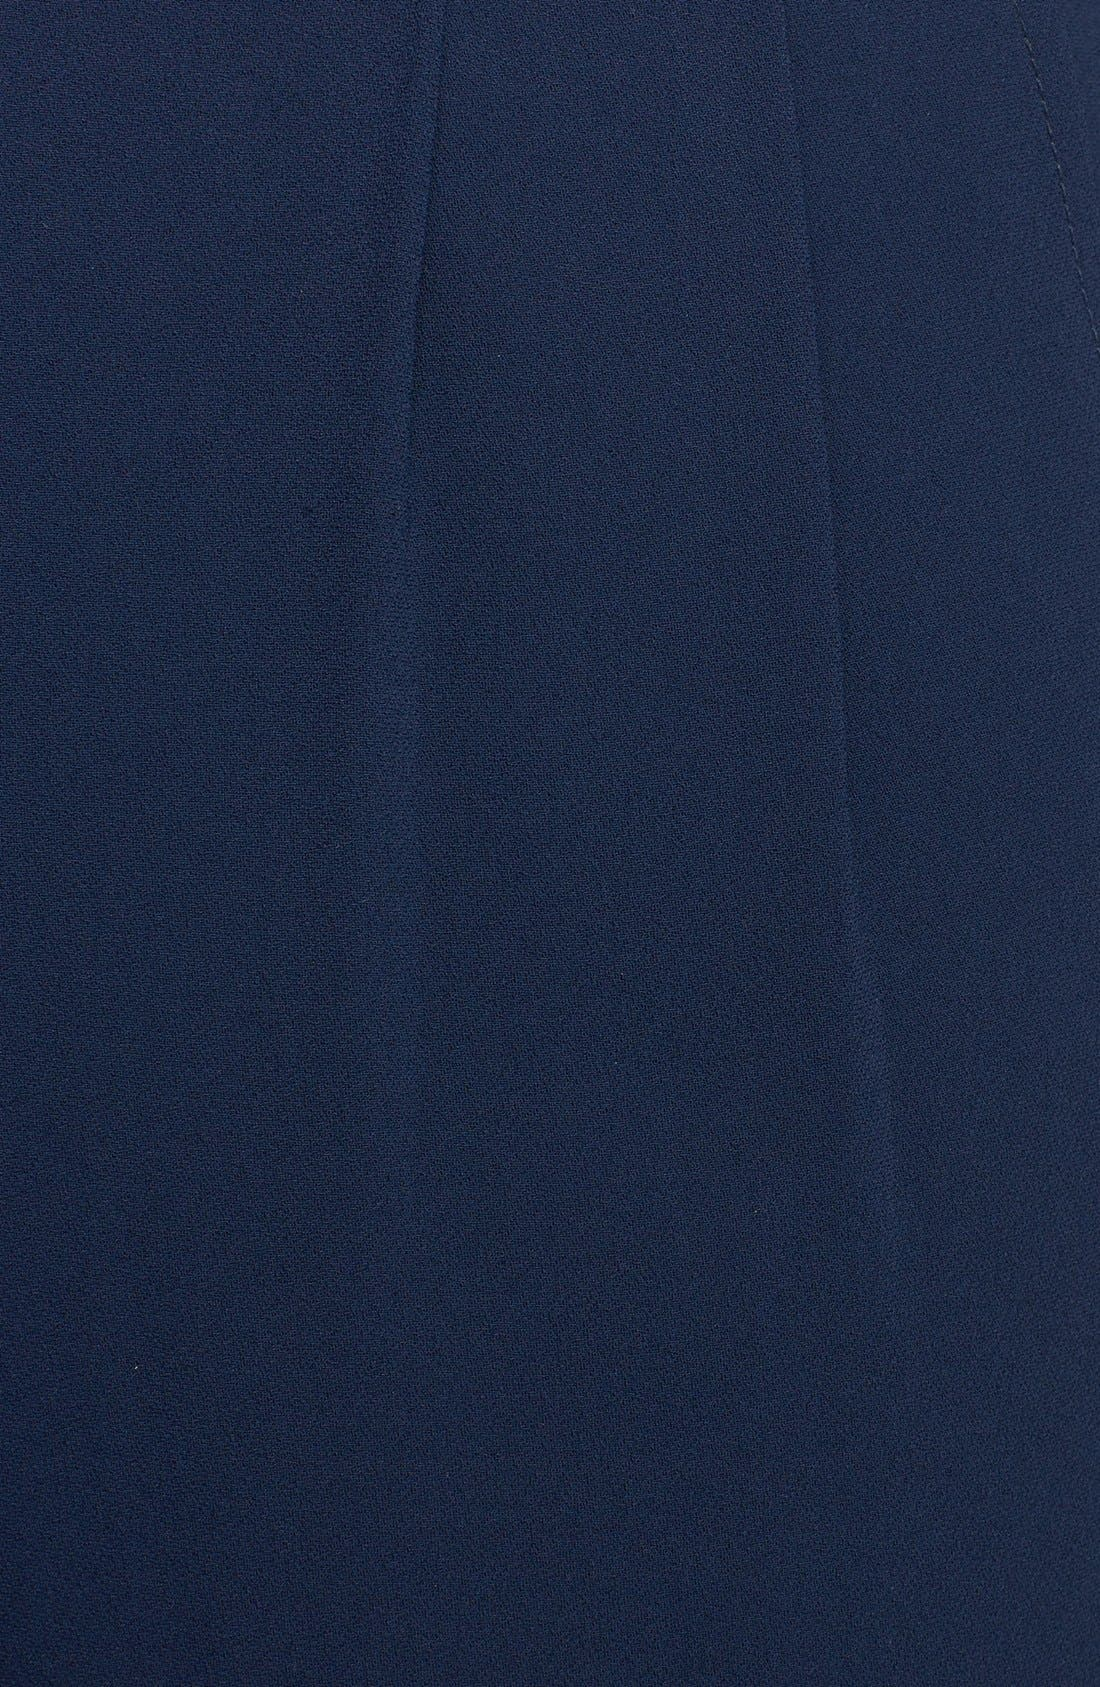 Alternate Image 3  - Trina Turk 'Kendrea' Drawstring Waist Shorts